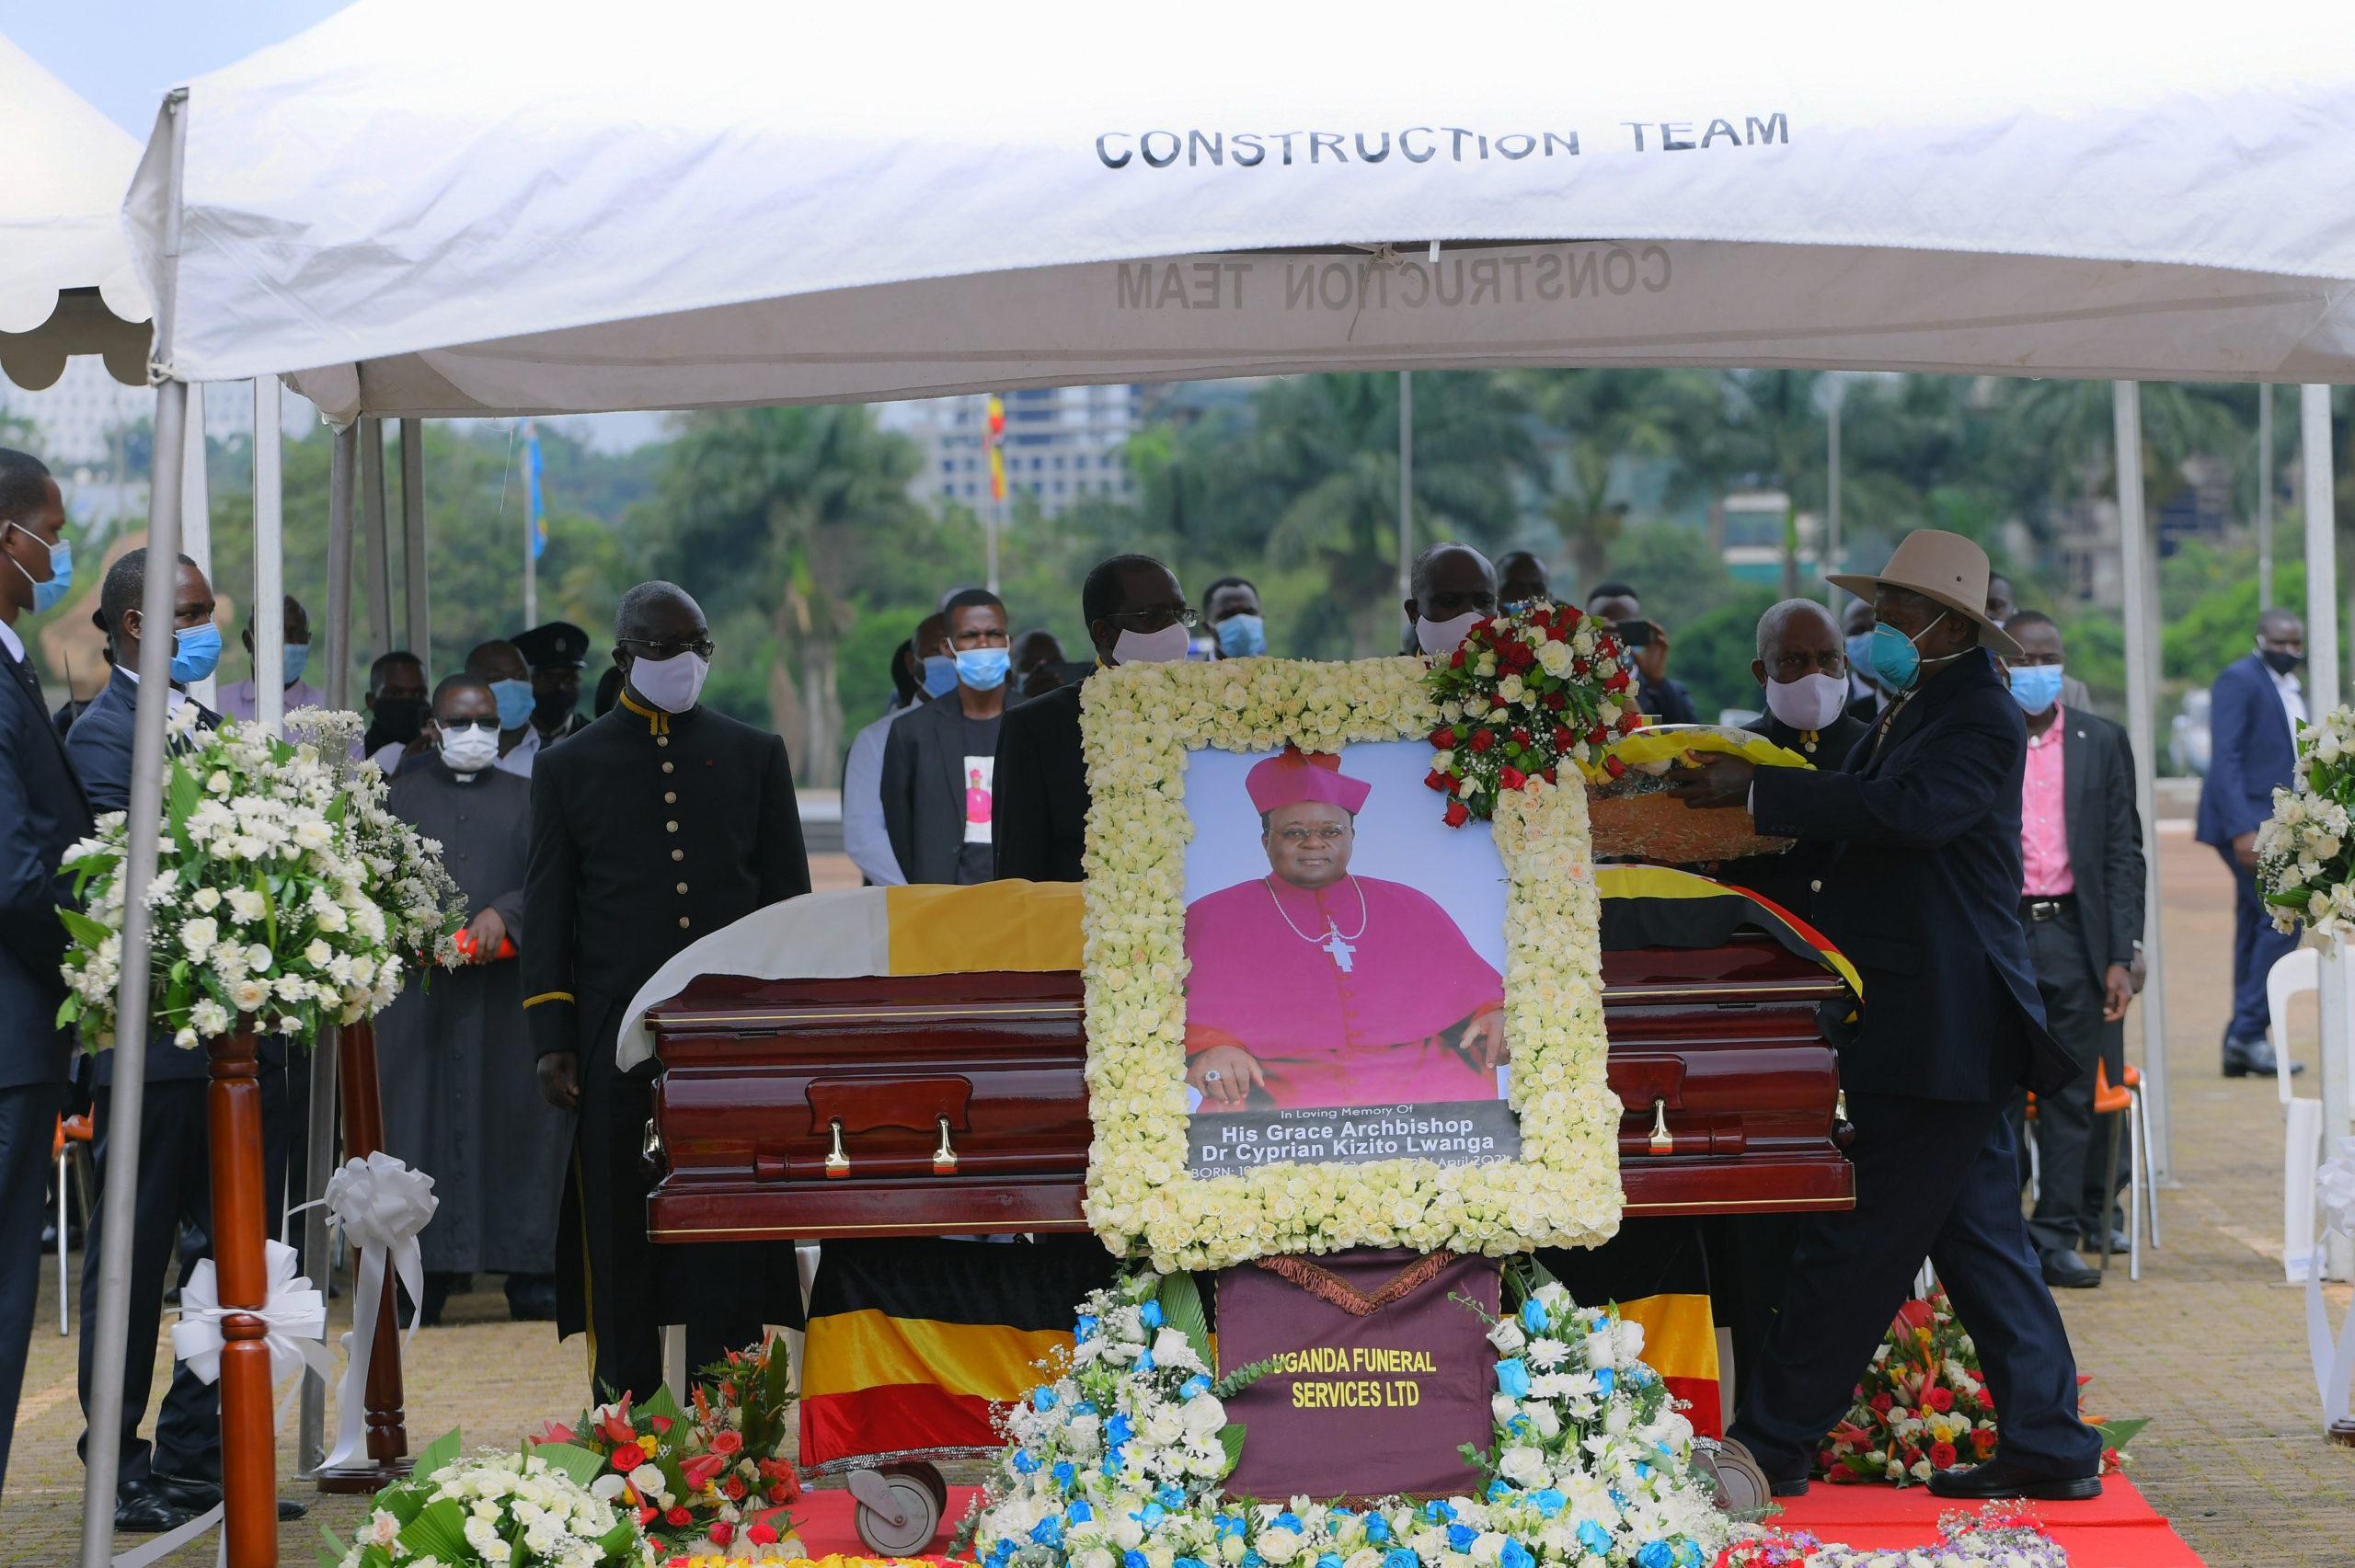 President Museveni at Kololo during the State funeral ceremony of Archbishop Kizito Lwanga